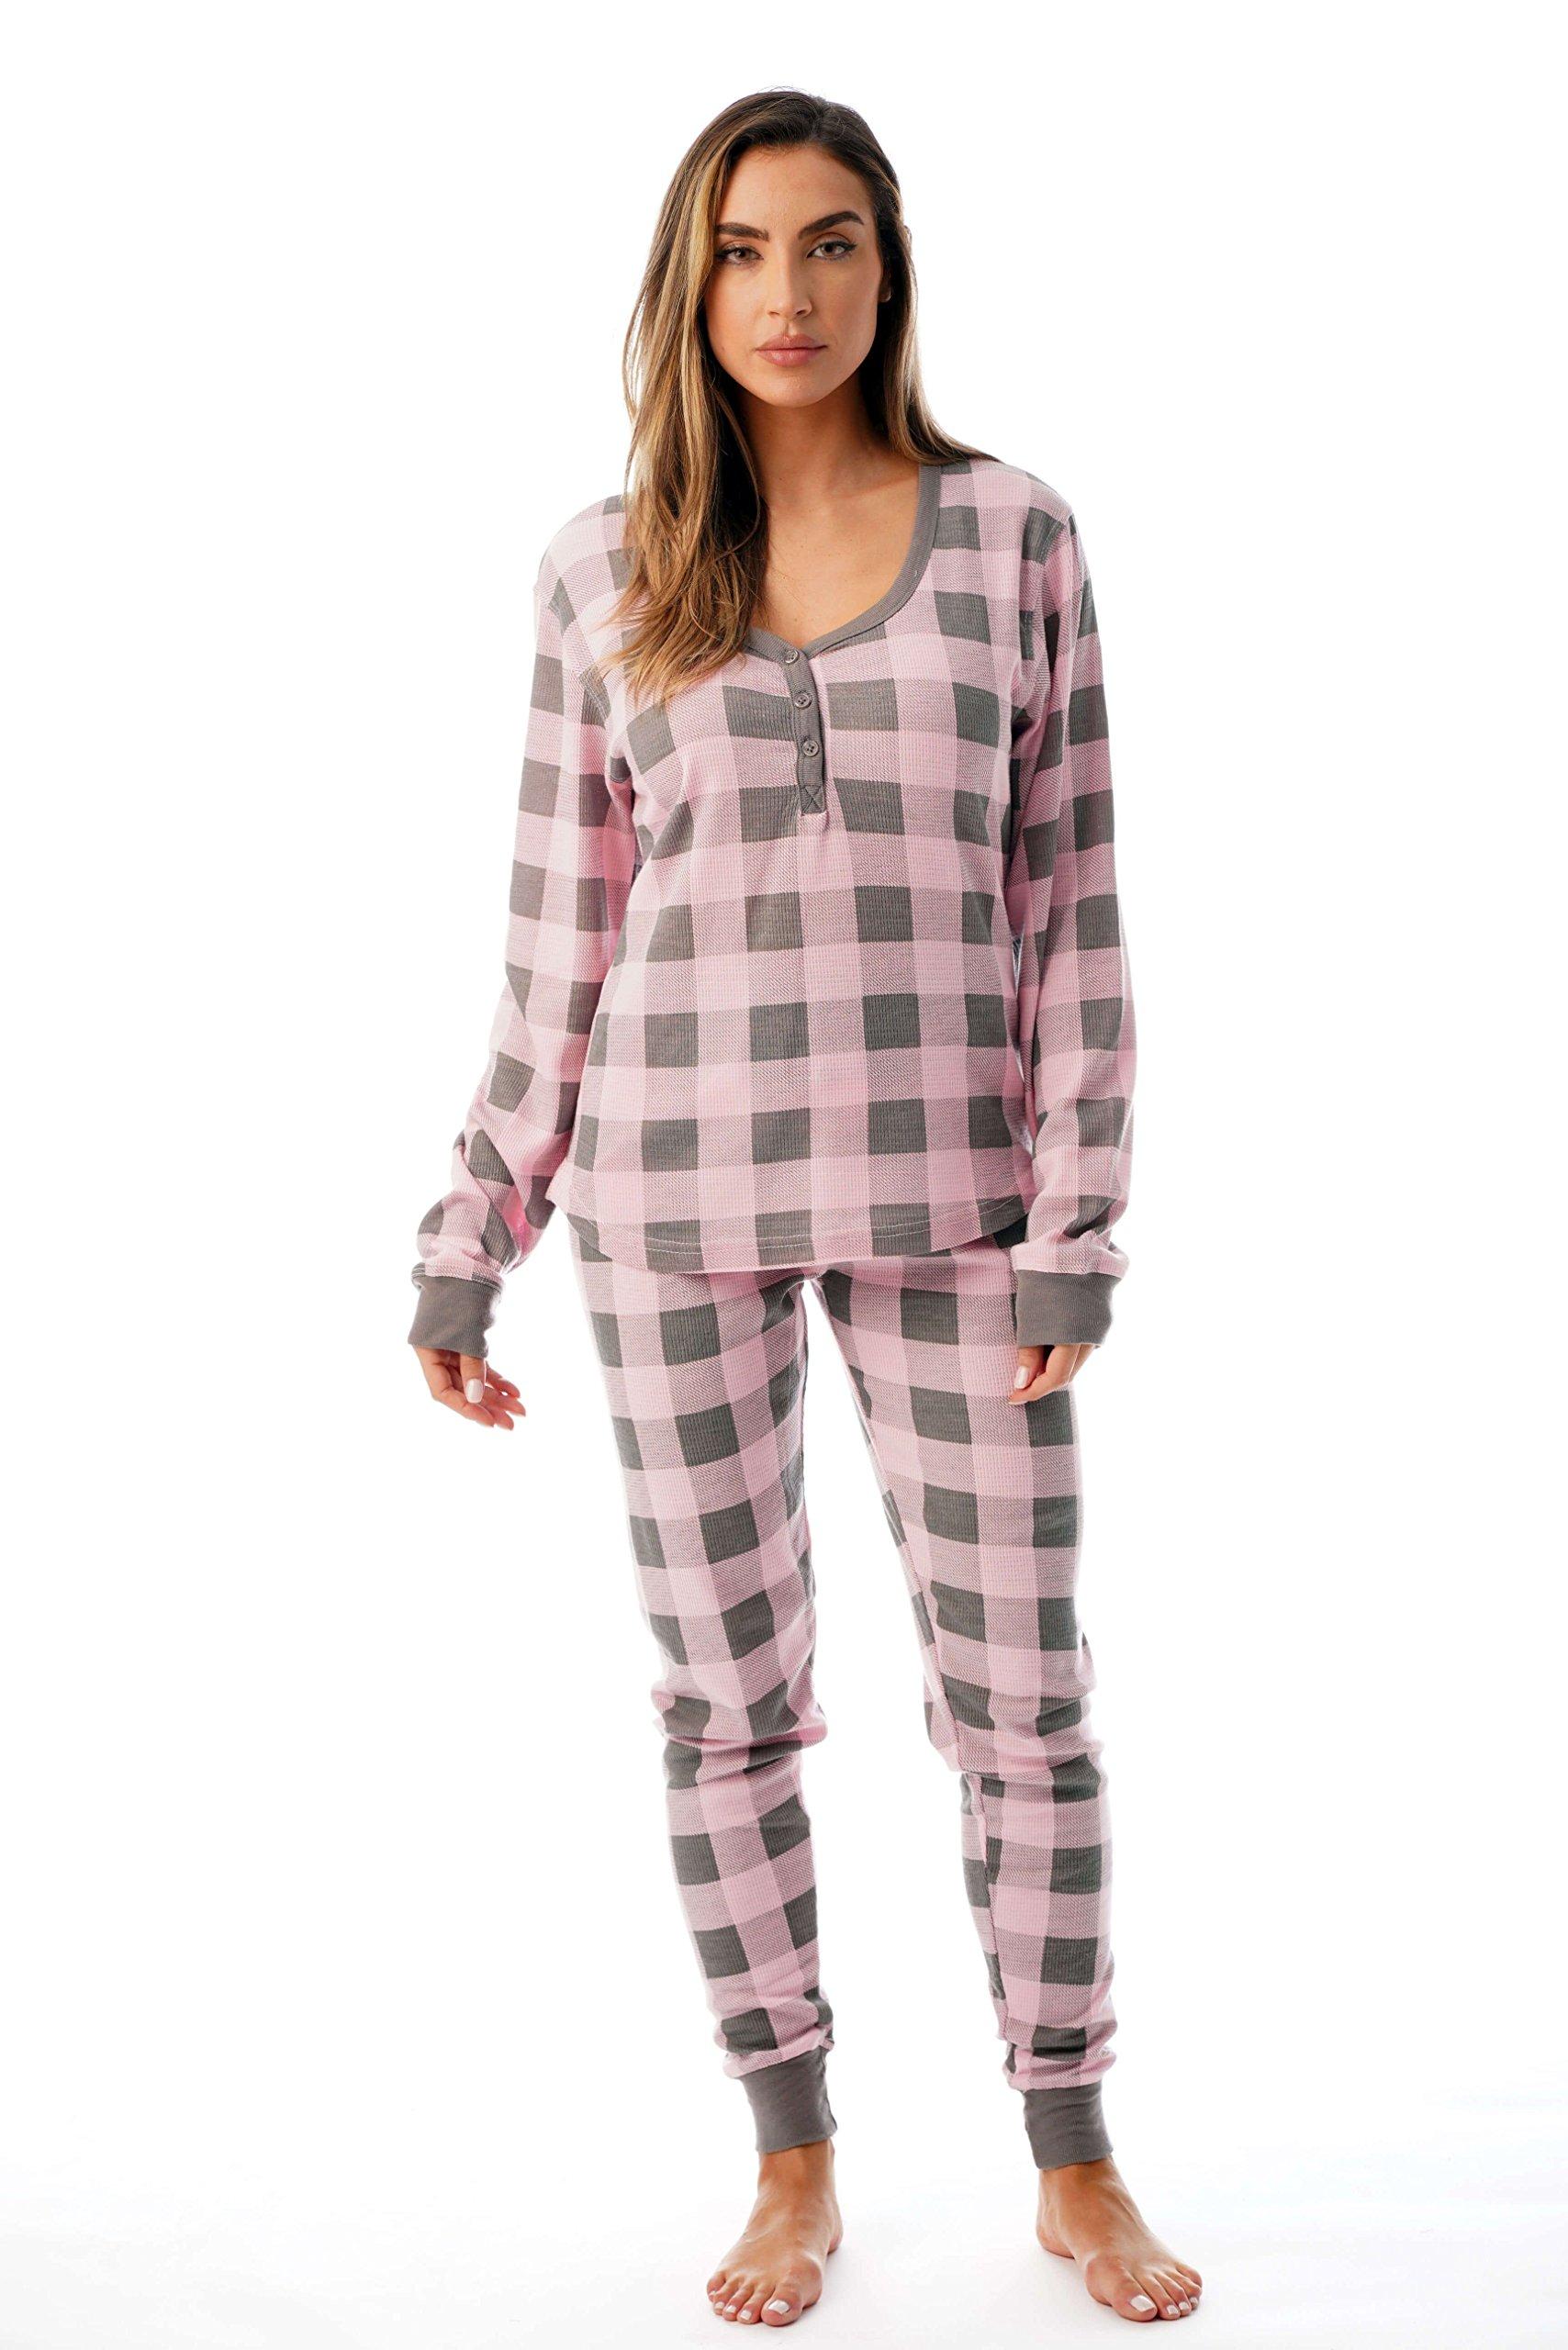 #followme Buffalo Plaid 2 Piece Base Layer Thermal Underwear Set for Women 6372-10195-NEW-PNK-M by #followme